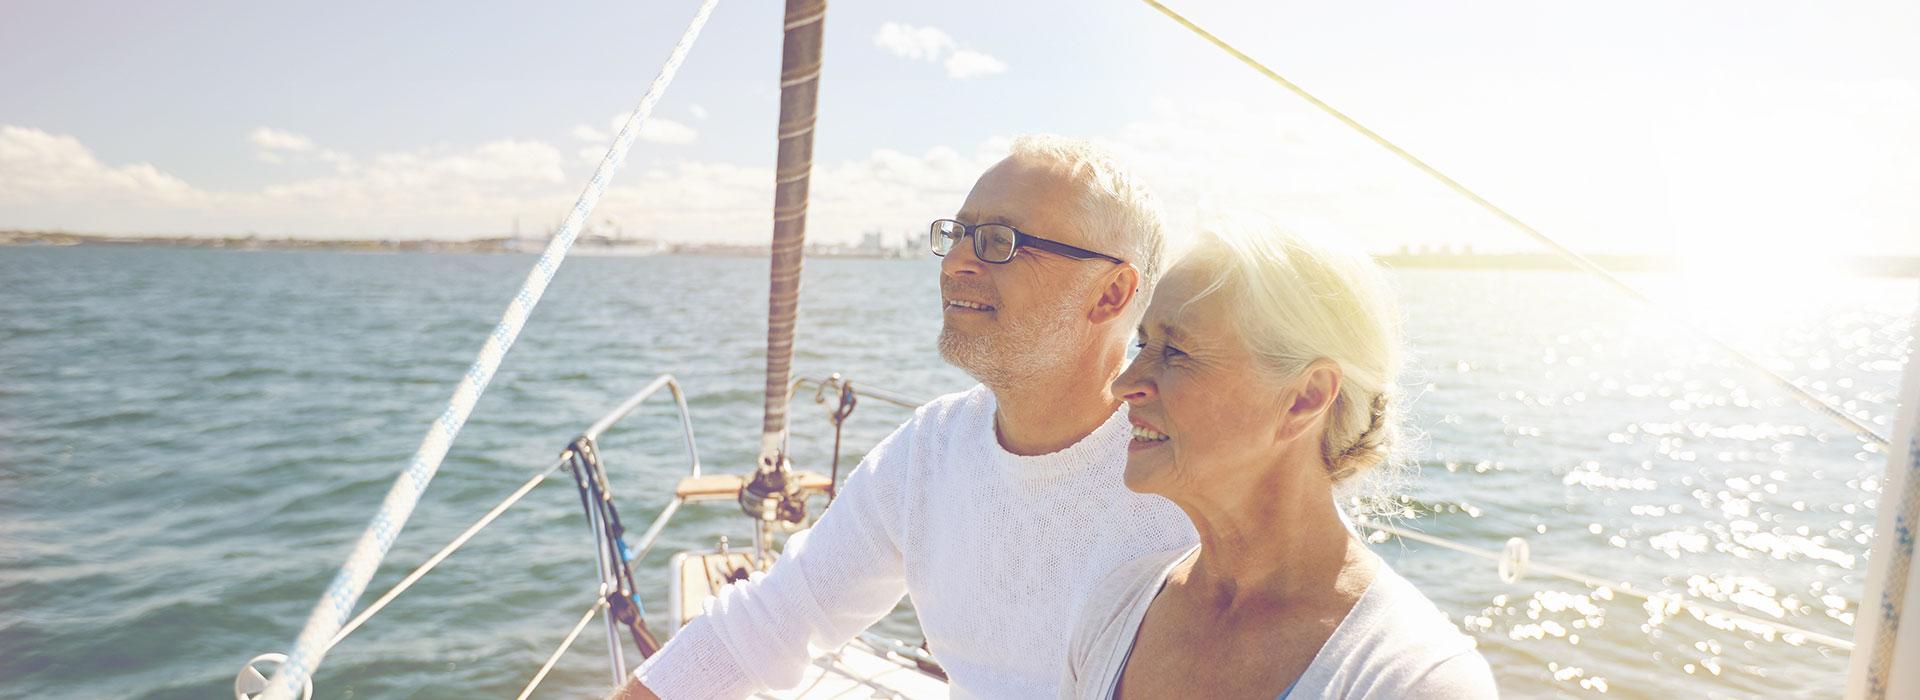 seniors voyages